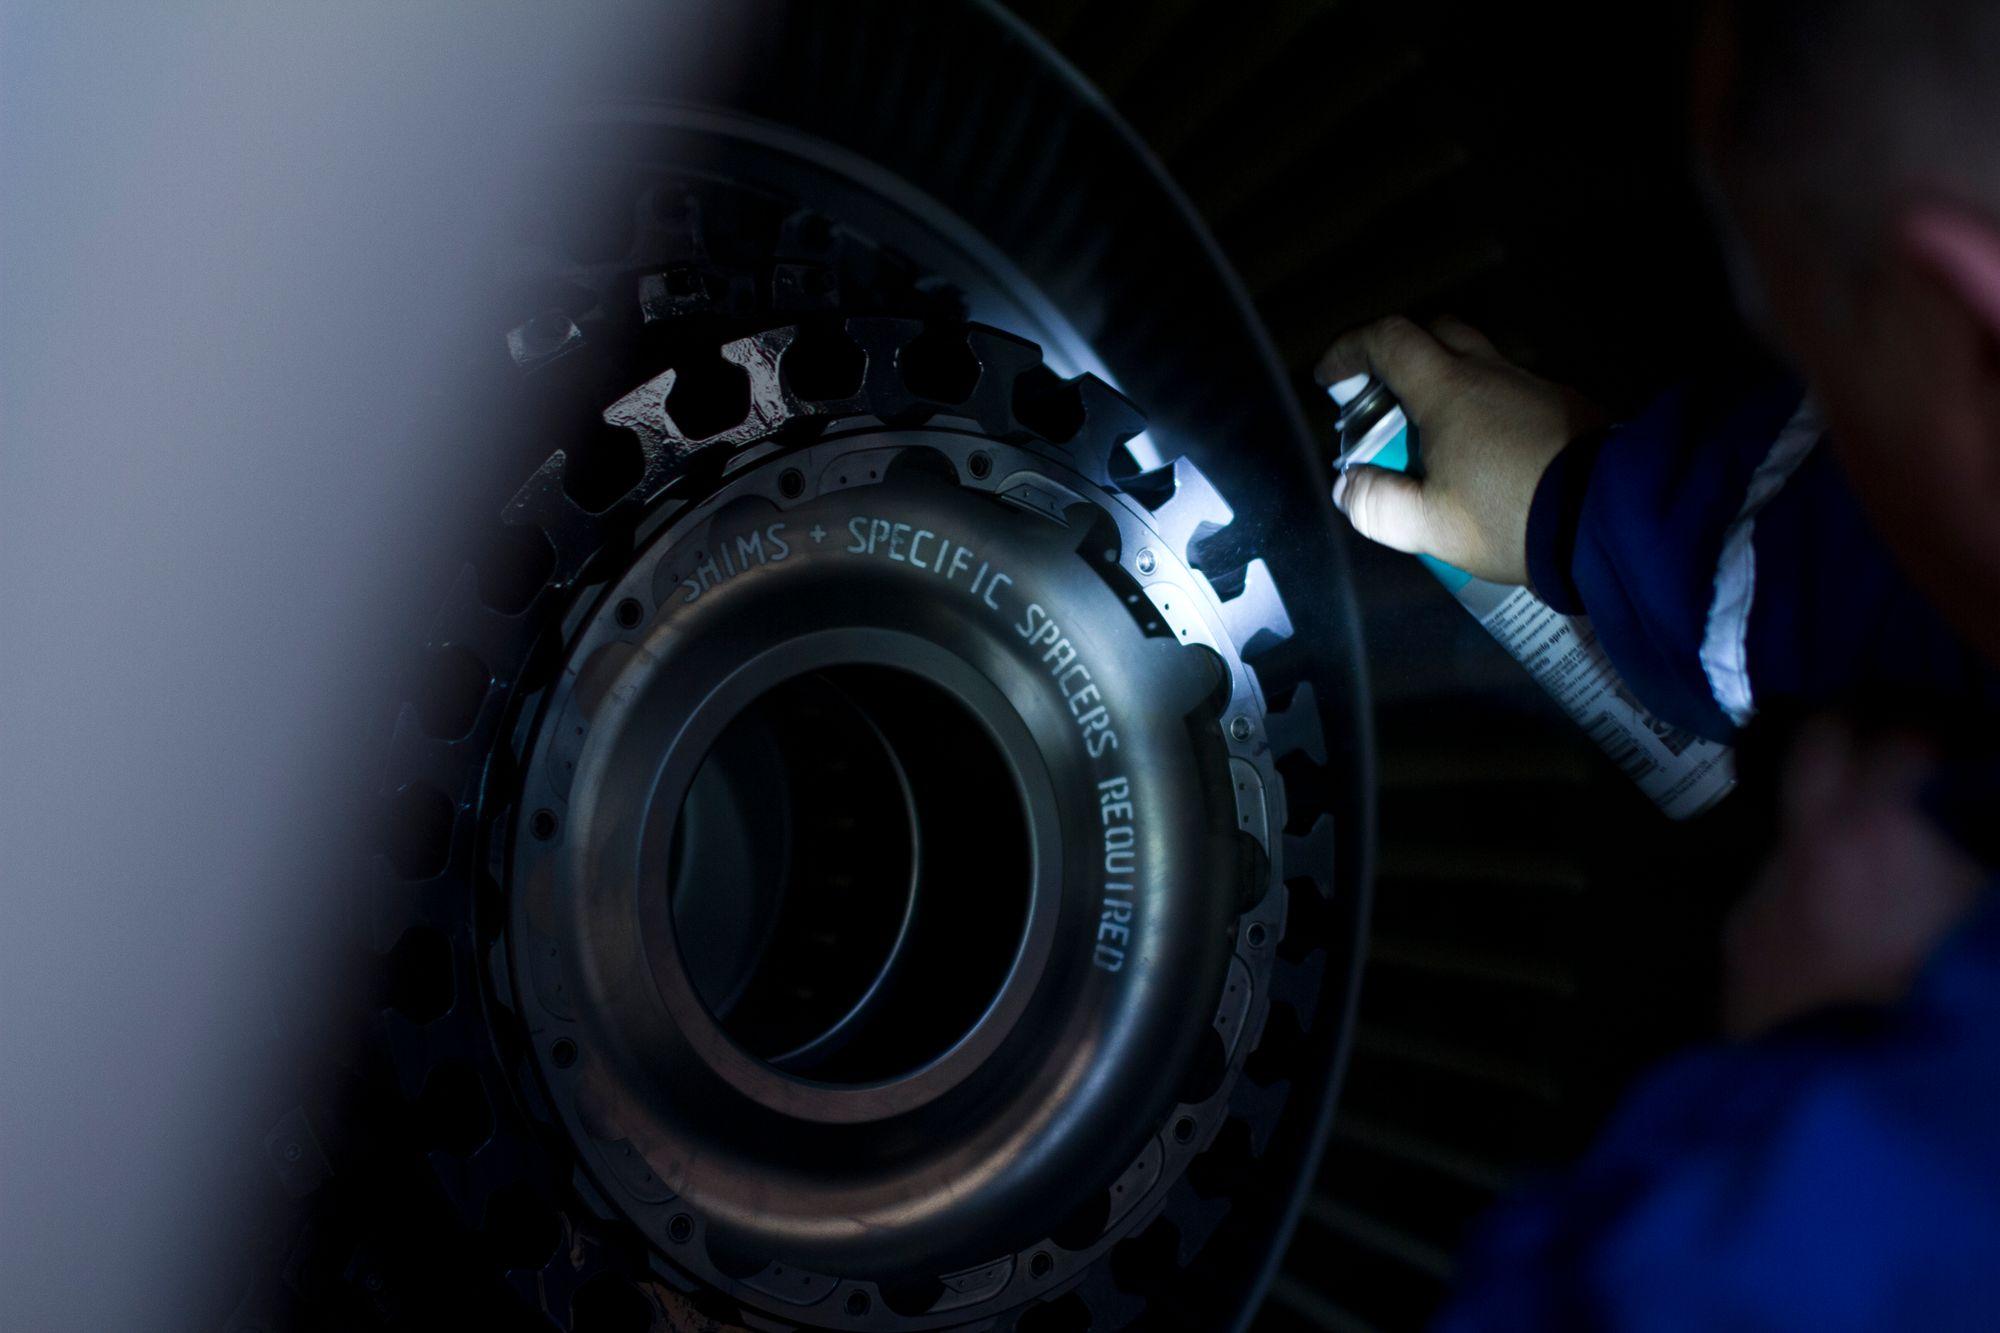 FL Technics Engine Services quick turn activities gain momentum